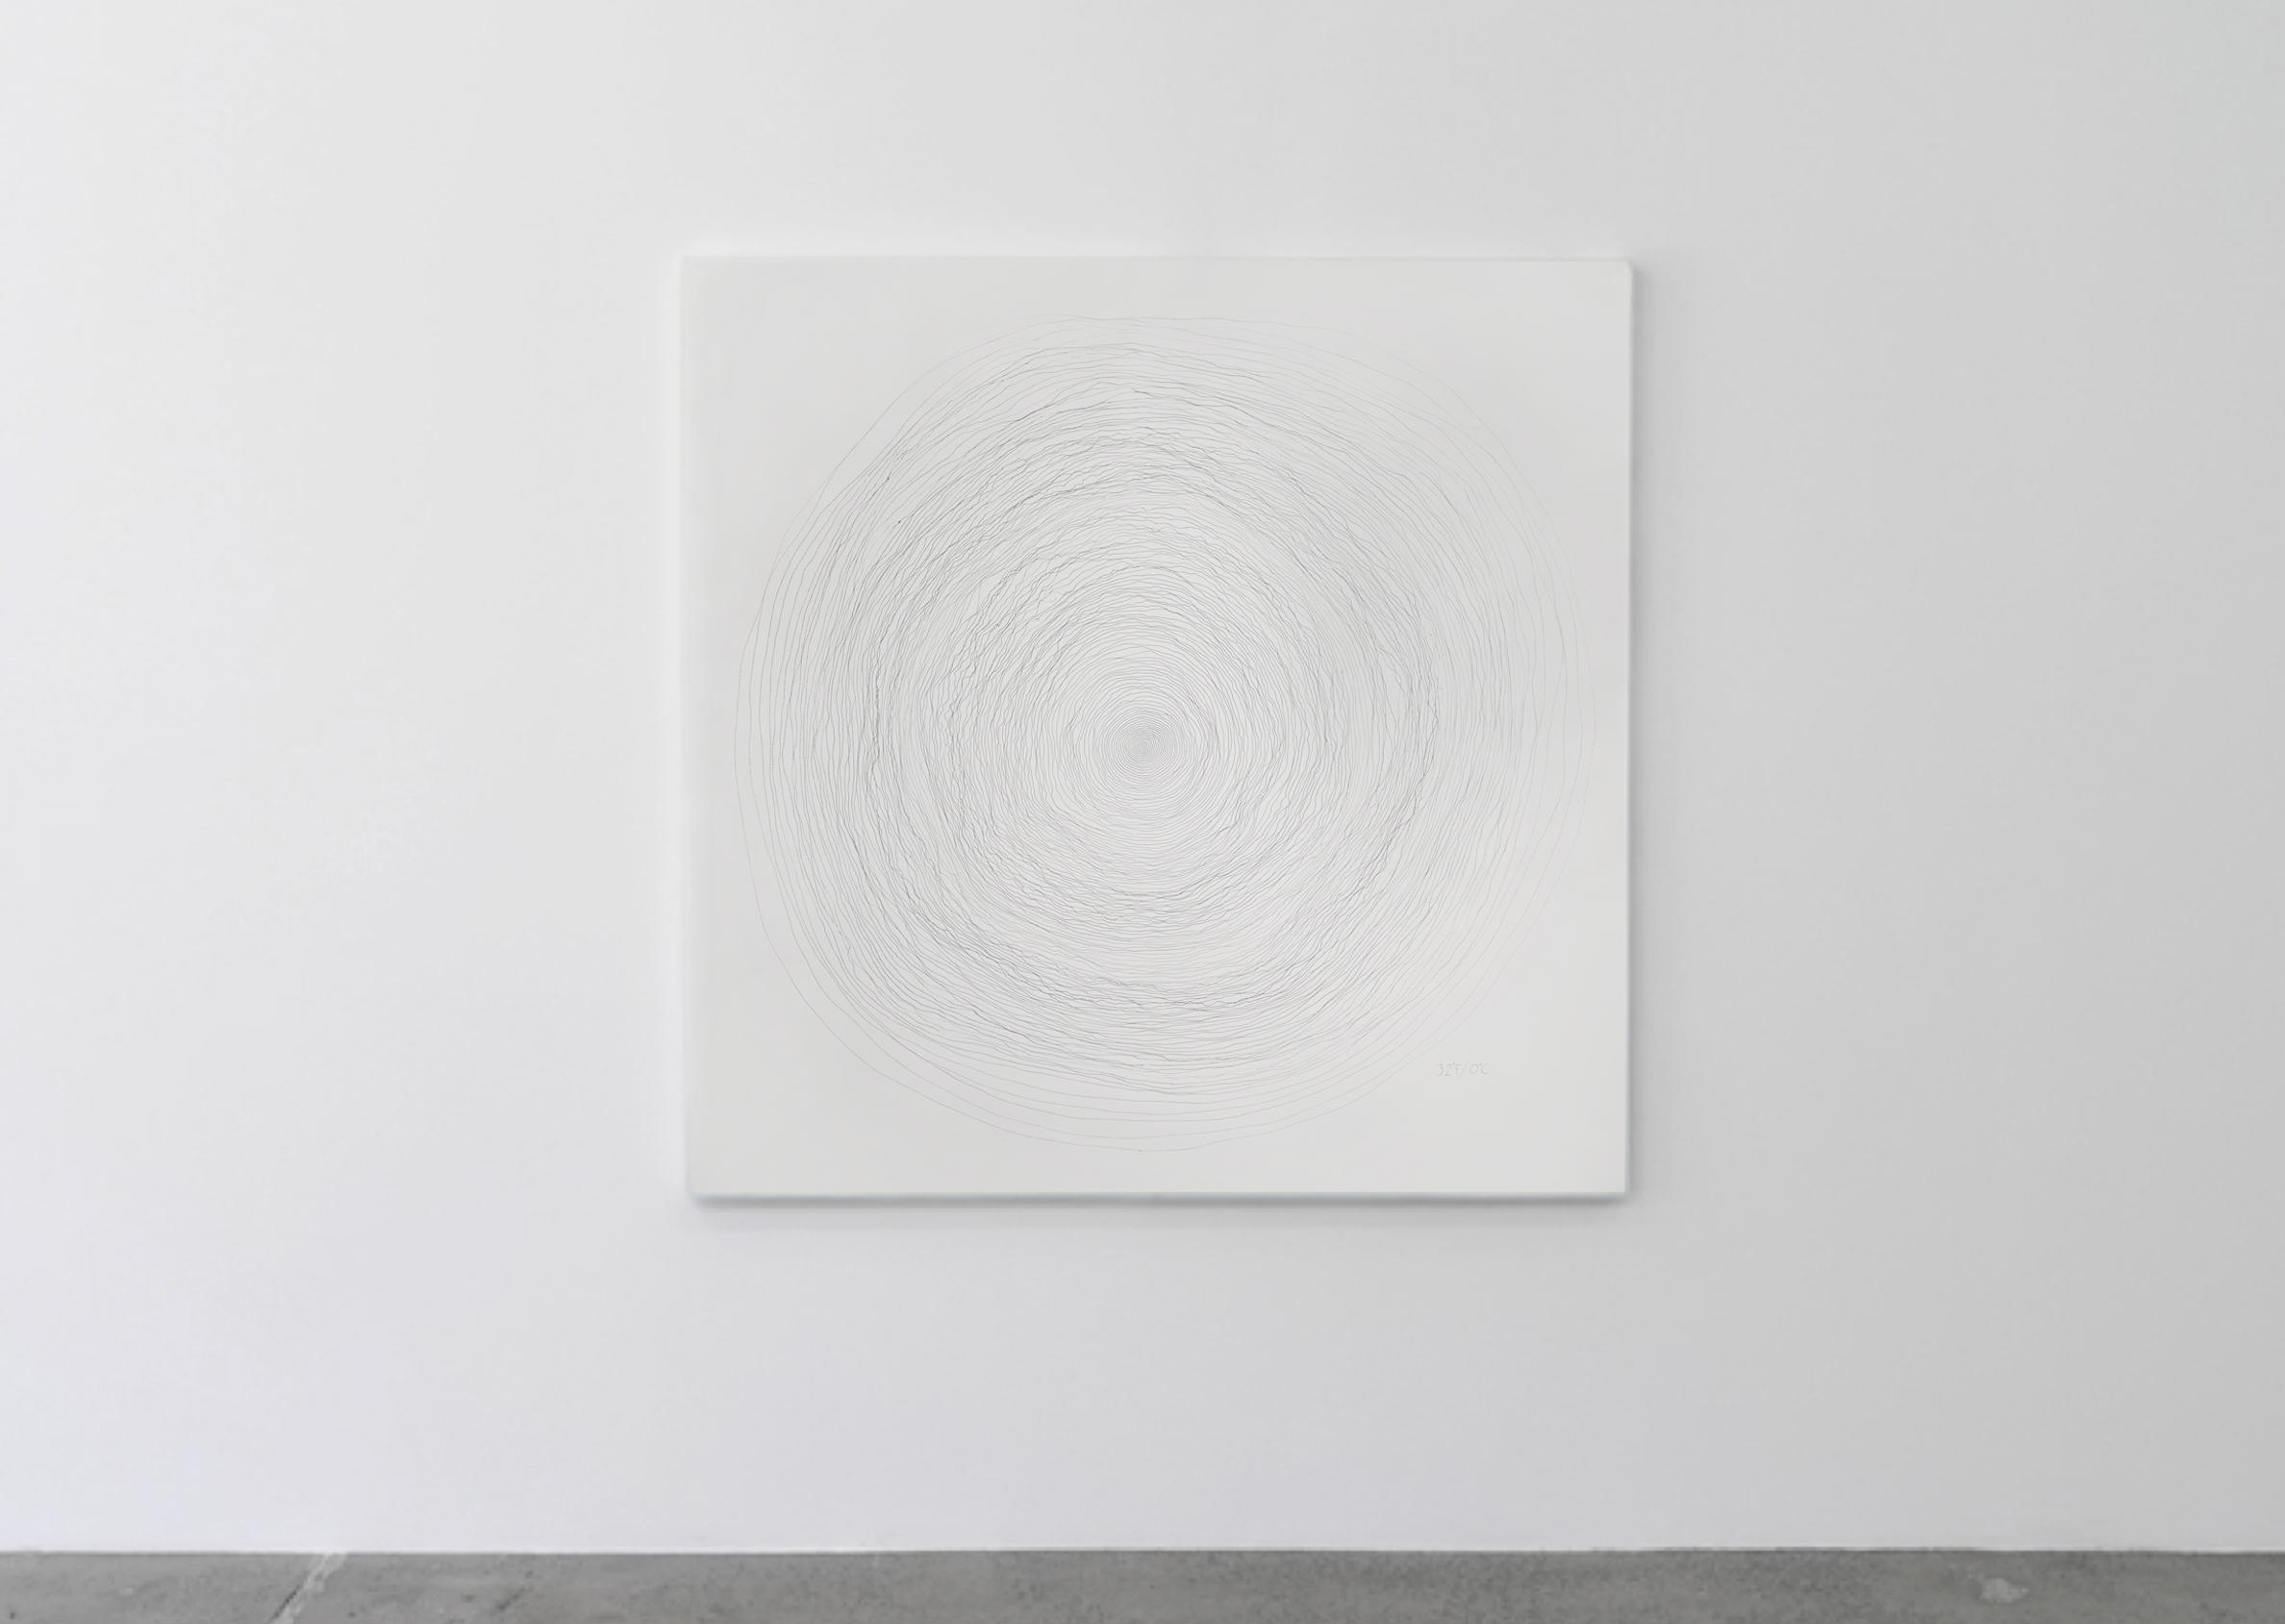 Shiver Lines at 32ºF/0ºC ink on paper ryan meyer